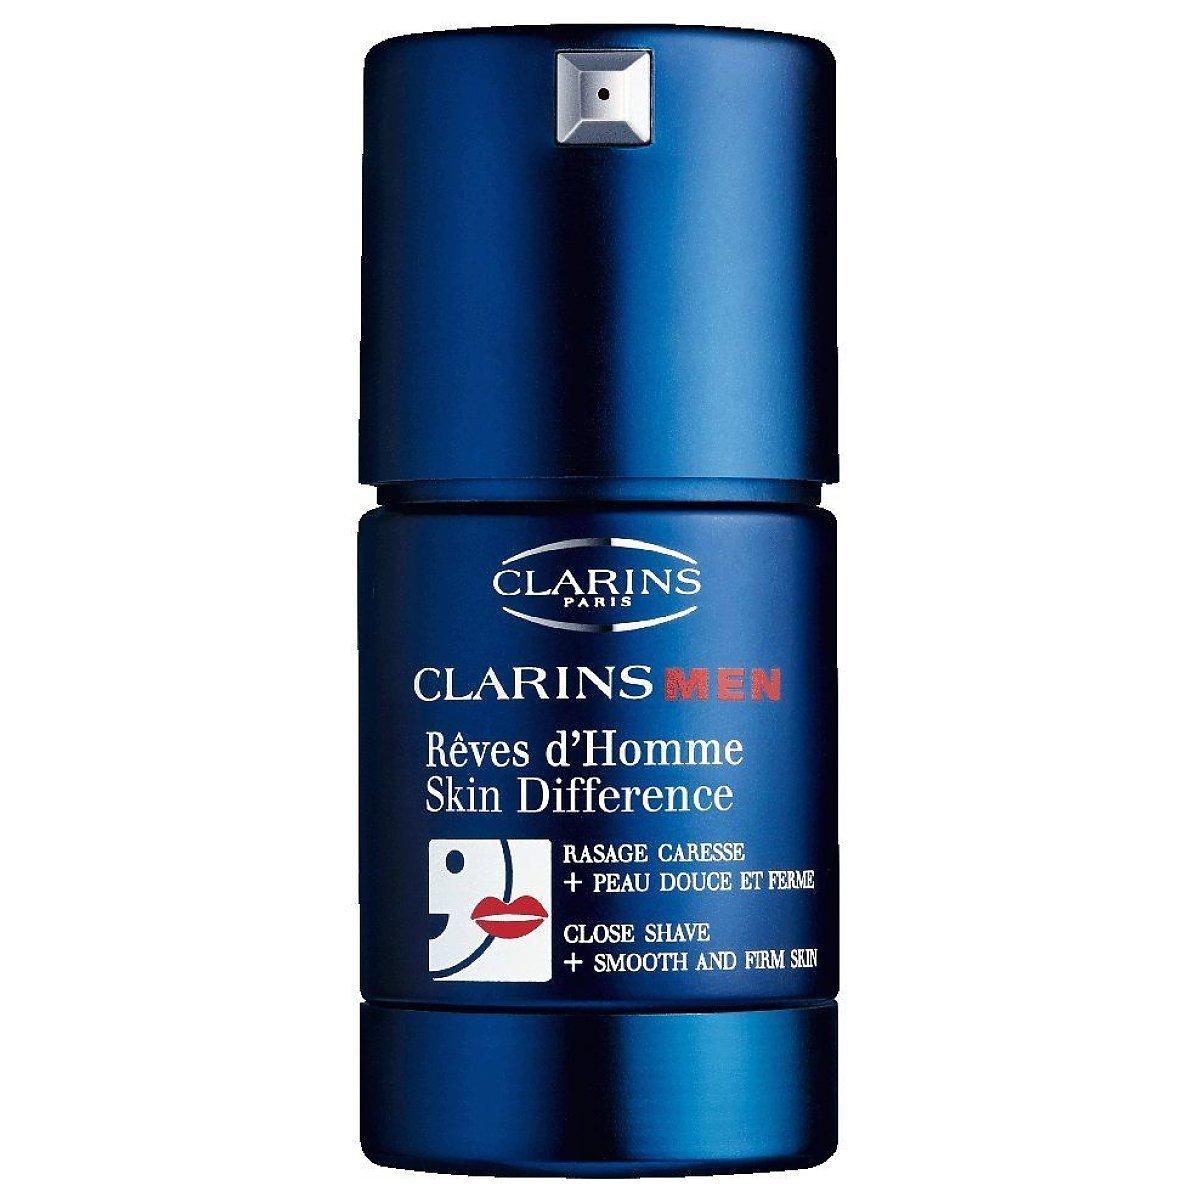 clarins men skin difference preparat zmi kczaj cy zarost 2x15ml 30ml perfumeria. Black Bedroom Furniture Sets. Home Design Ideas